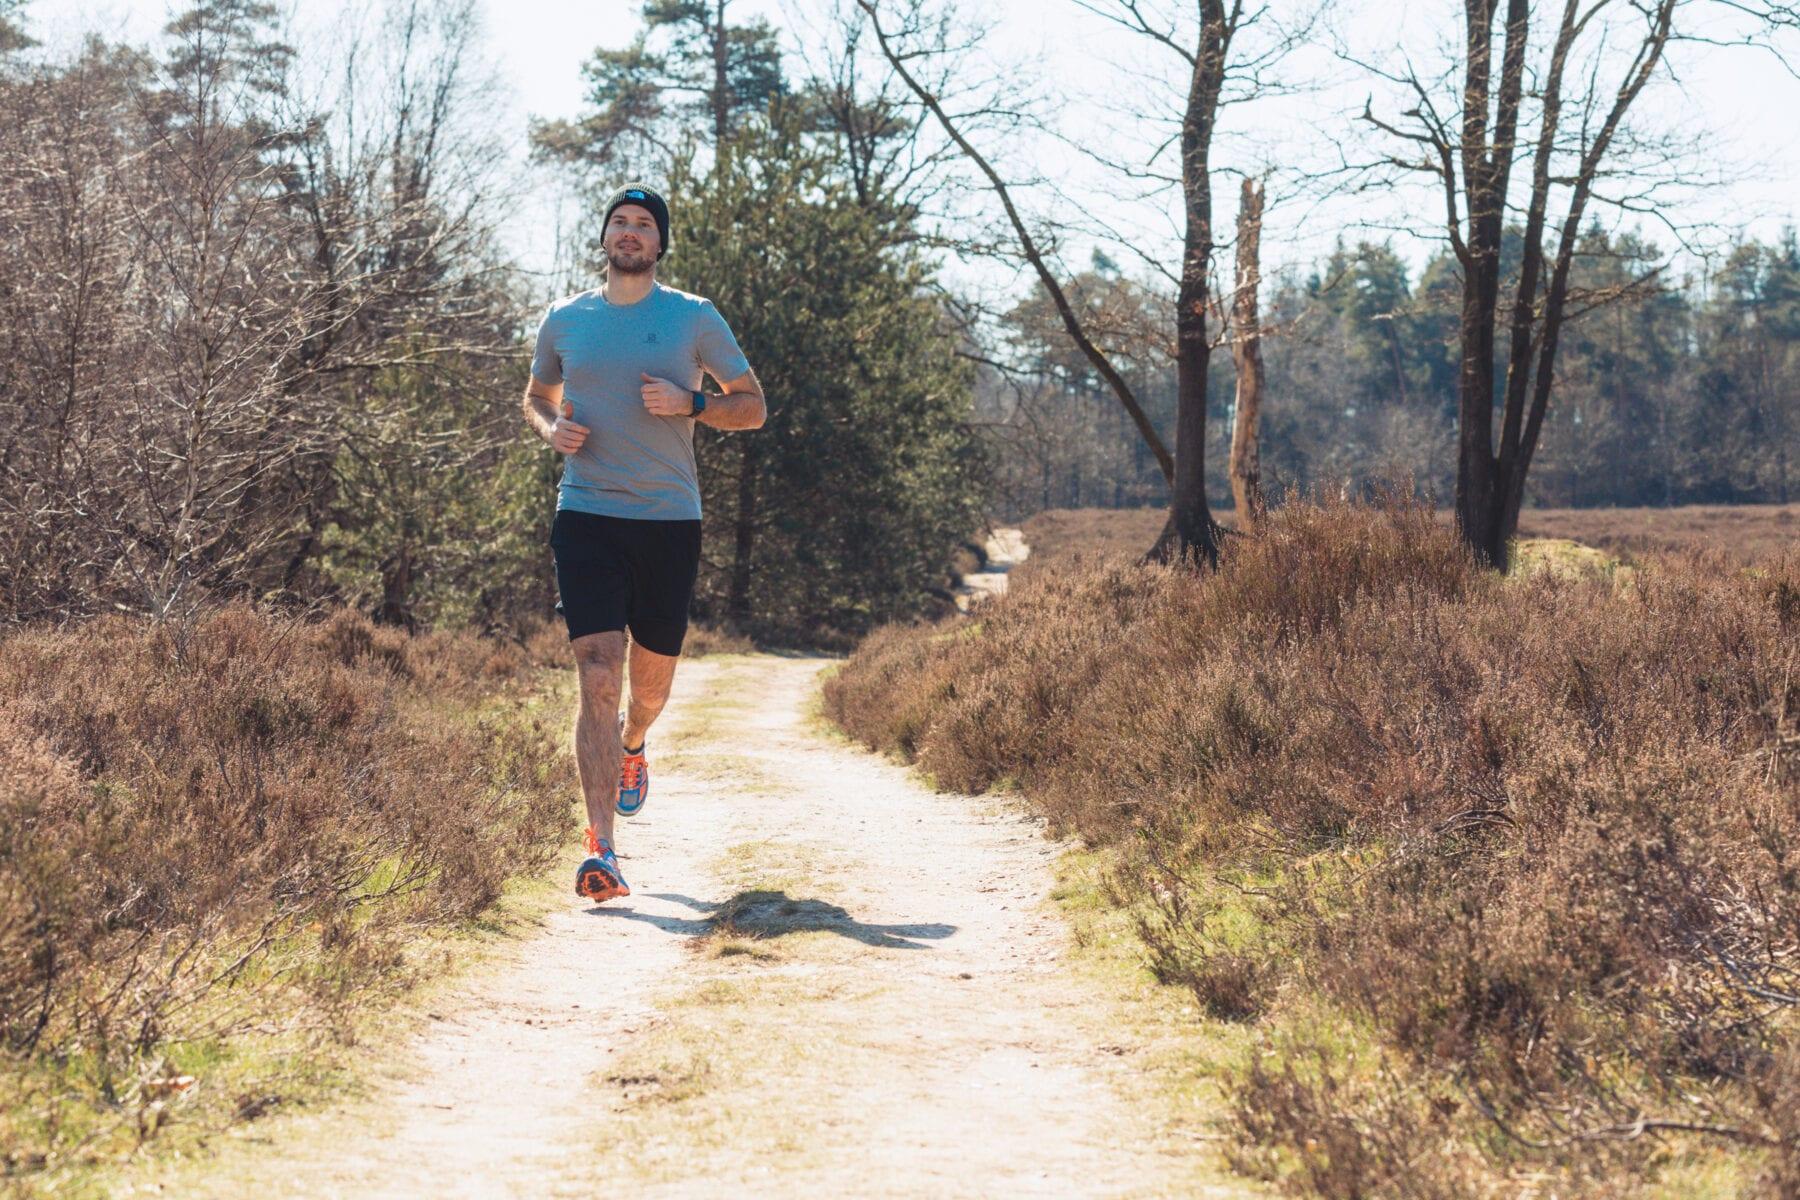 Veluwe trailrunning Hoka One One Mafate Speed 2